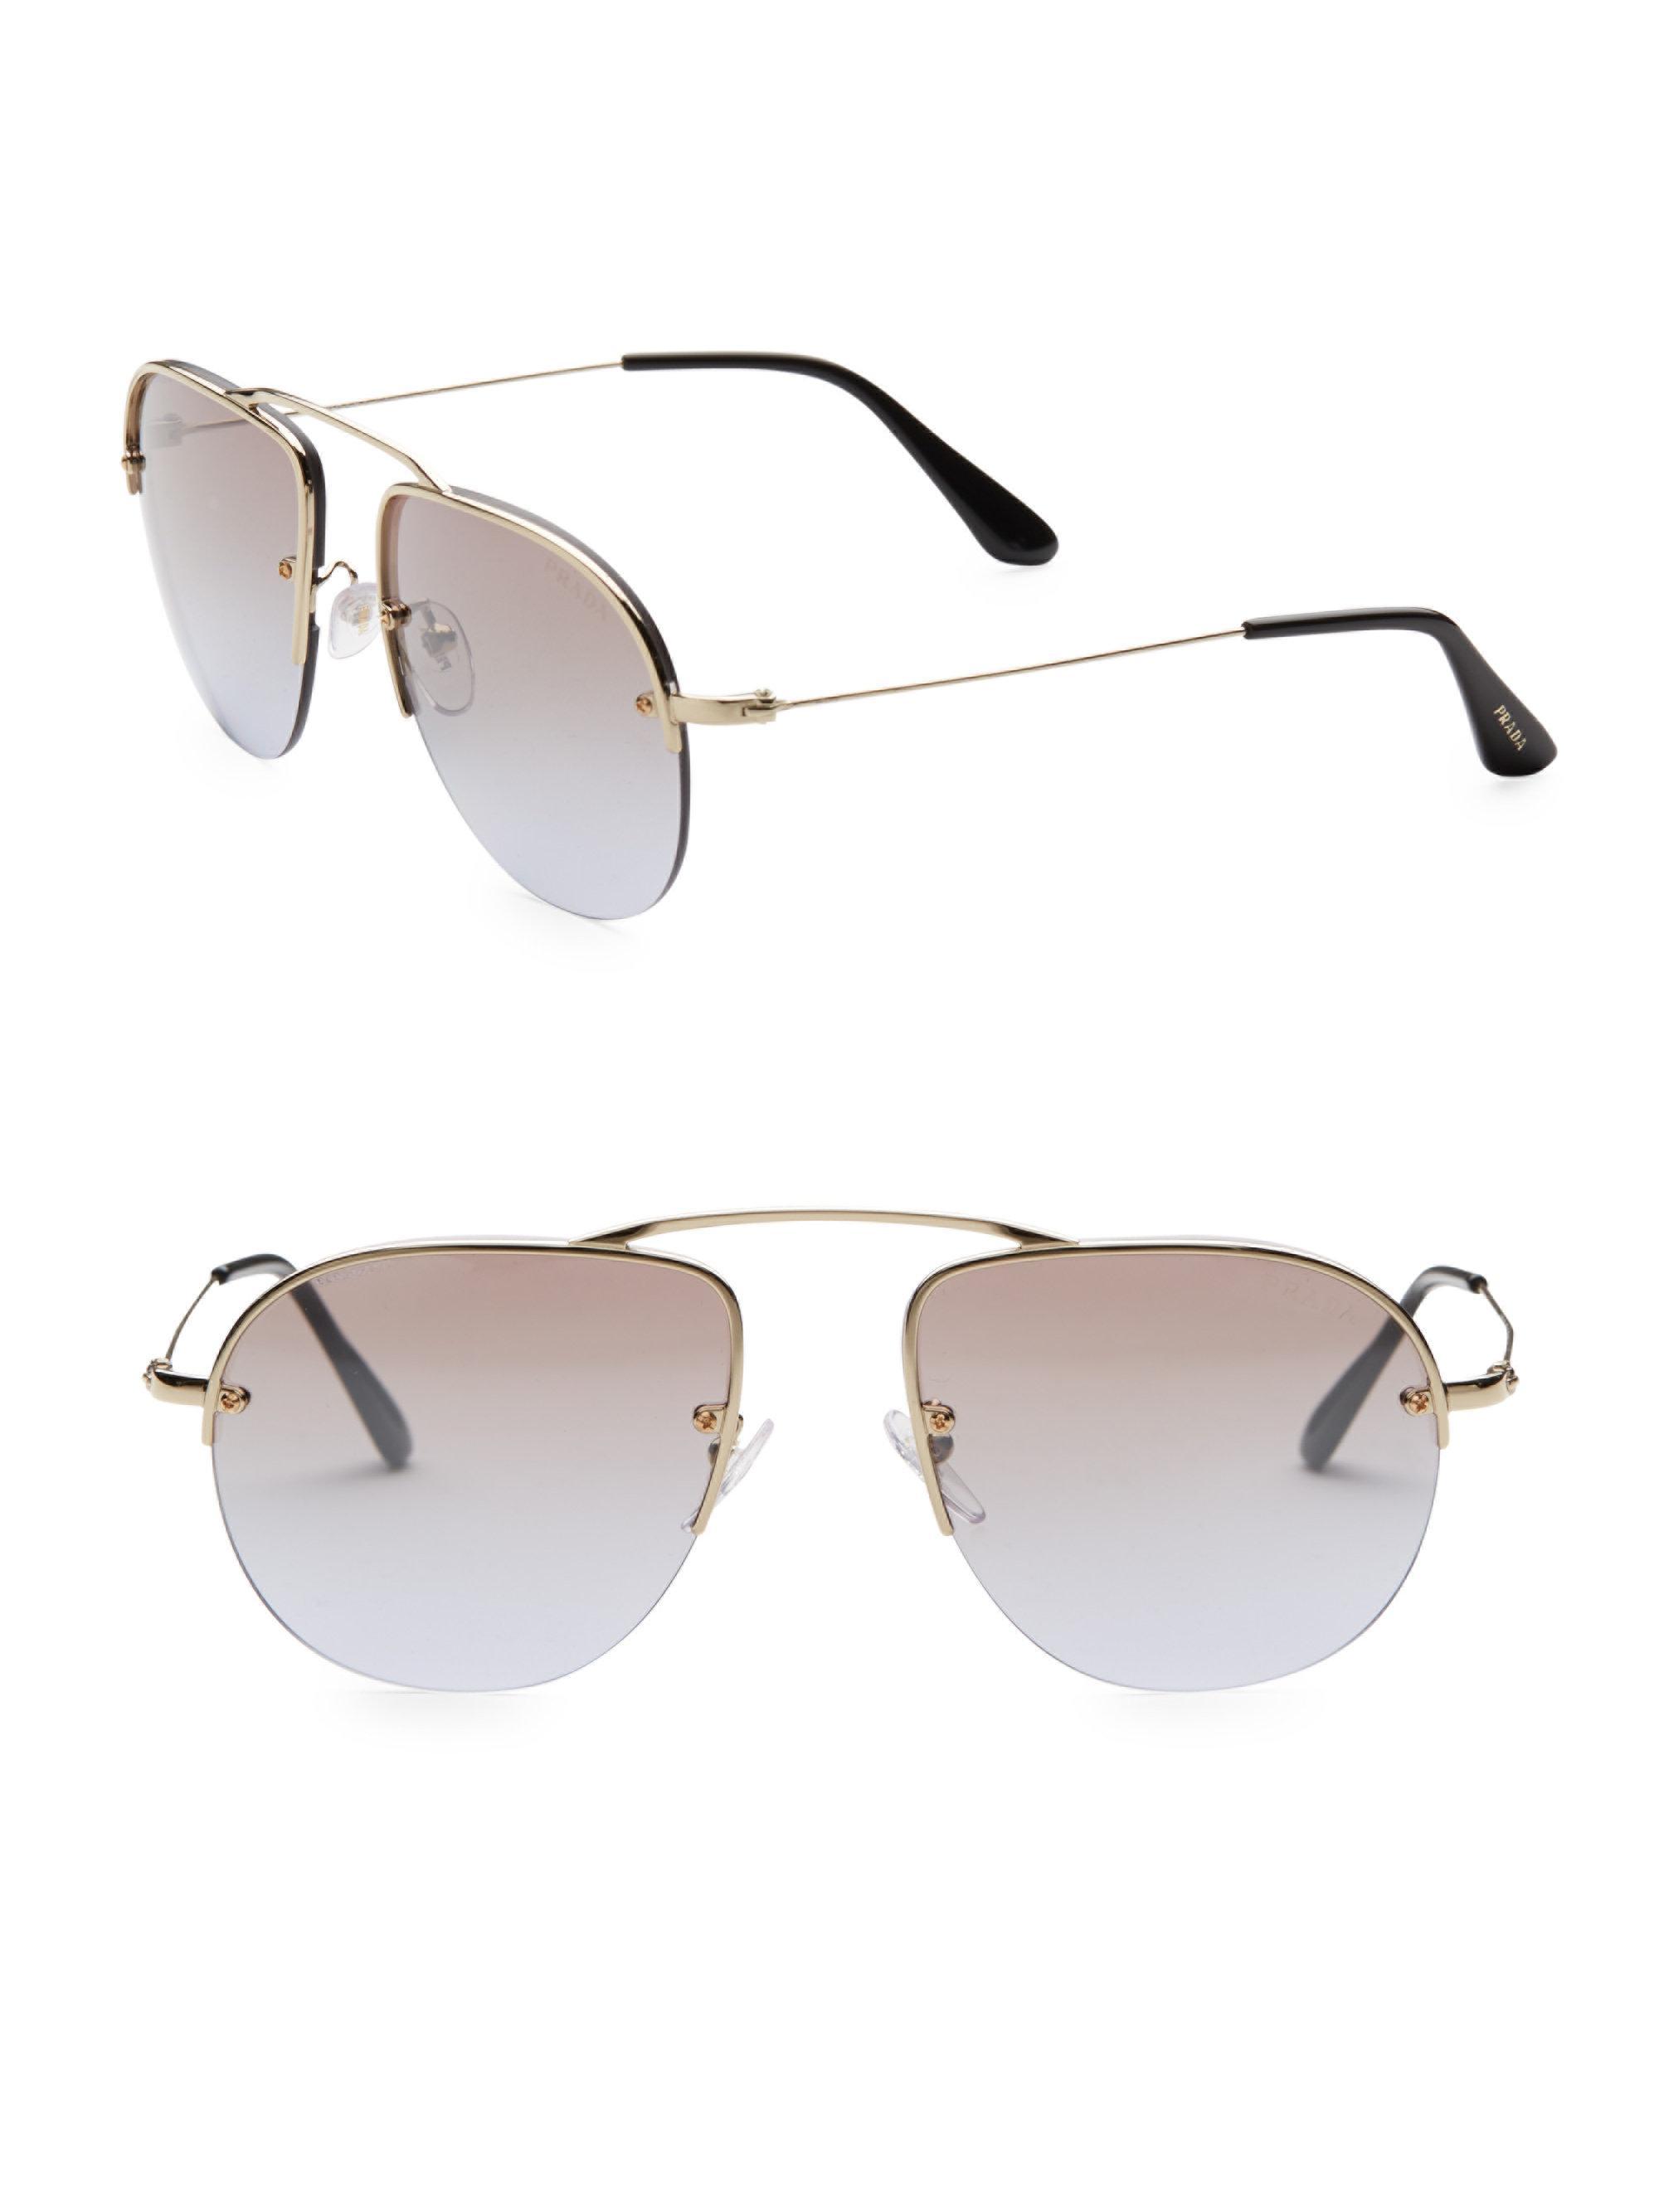 fe6f68110e ... purchase lyst prada teddy 55mm mirrored pilot sunglasses in metallic  16ba6 91203